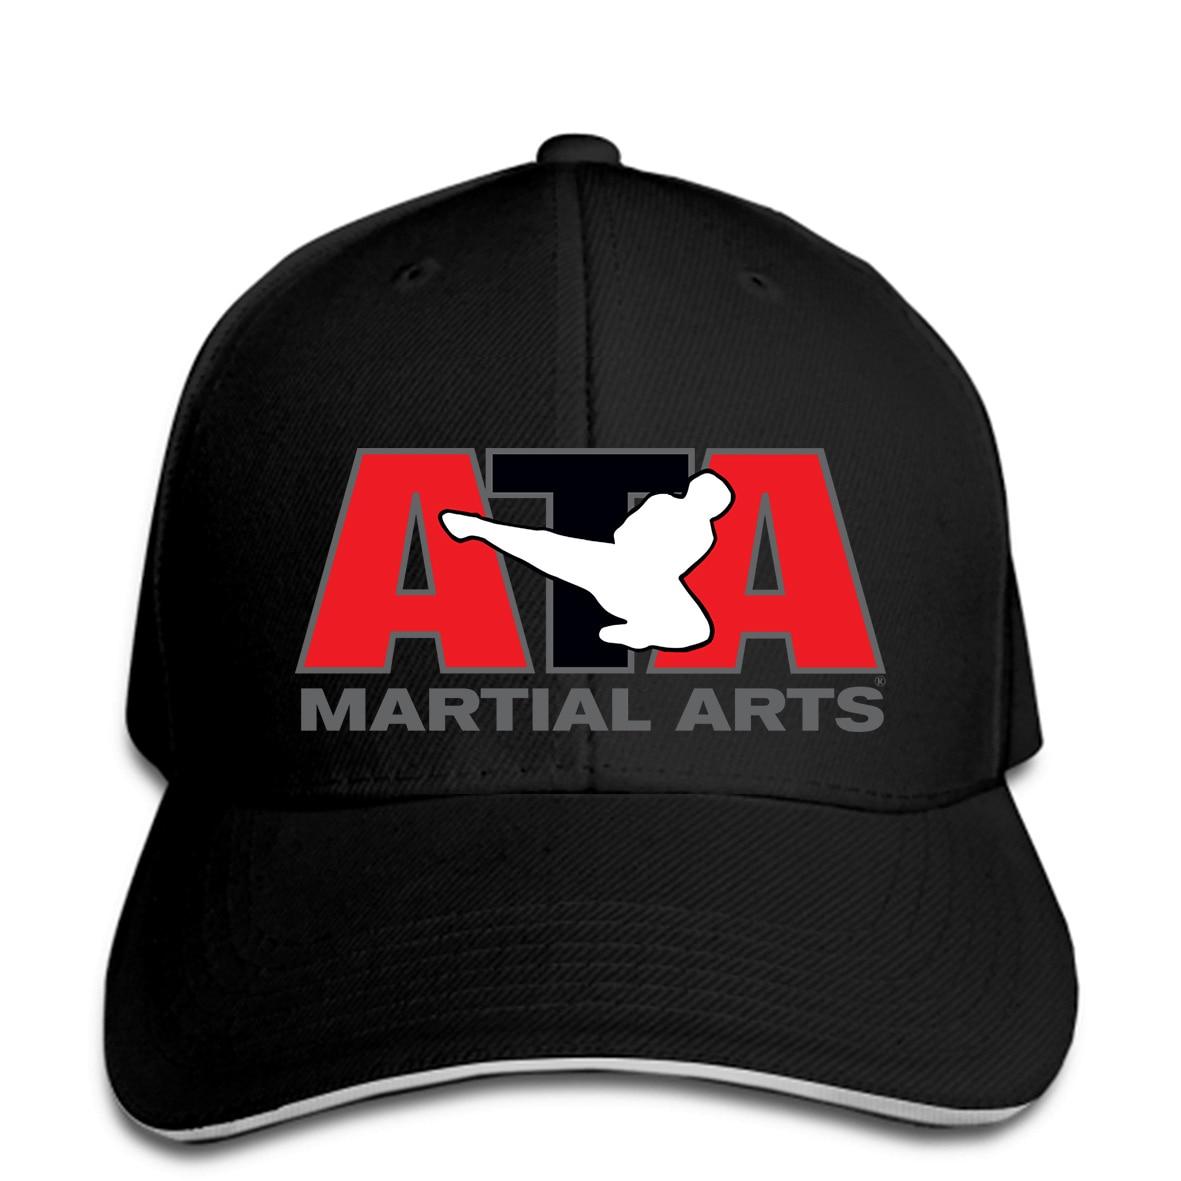 Los hombres gorra de béisbol americano Taekwondo Asociación Ata artes marciales gorra de béisbol con logotipo sombrero de mujer alcanzó su punto máximo